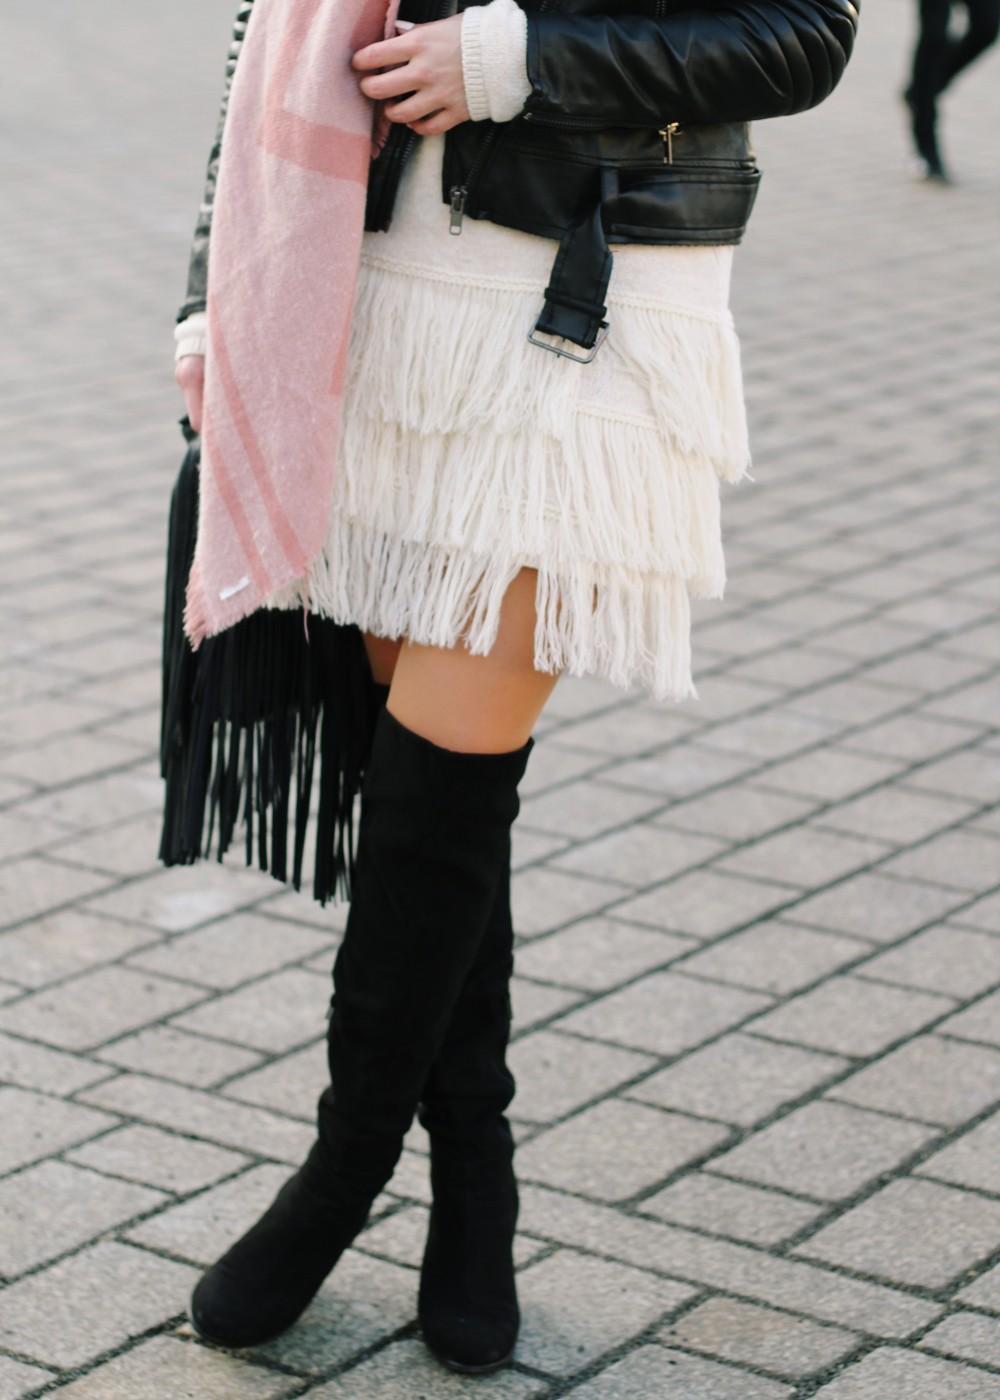 Fashion Week Berlin 2016 Outfit OOTD Fransen Strickkleid Lederjacke Overknees Schal Hut Fransentasche 11